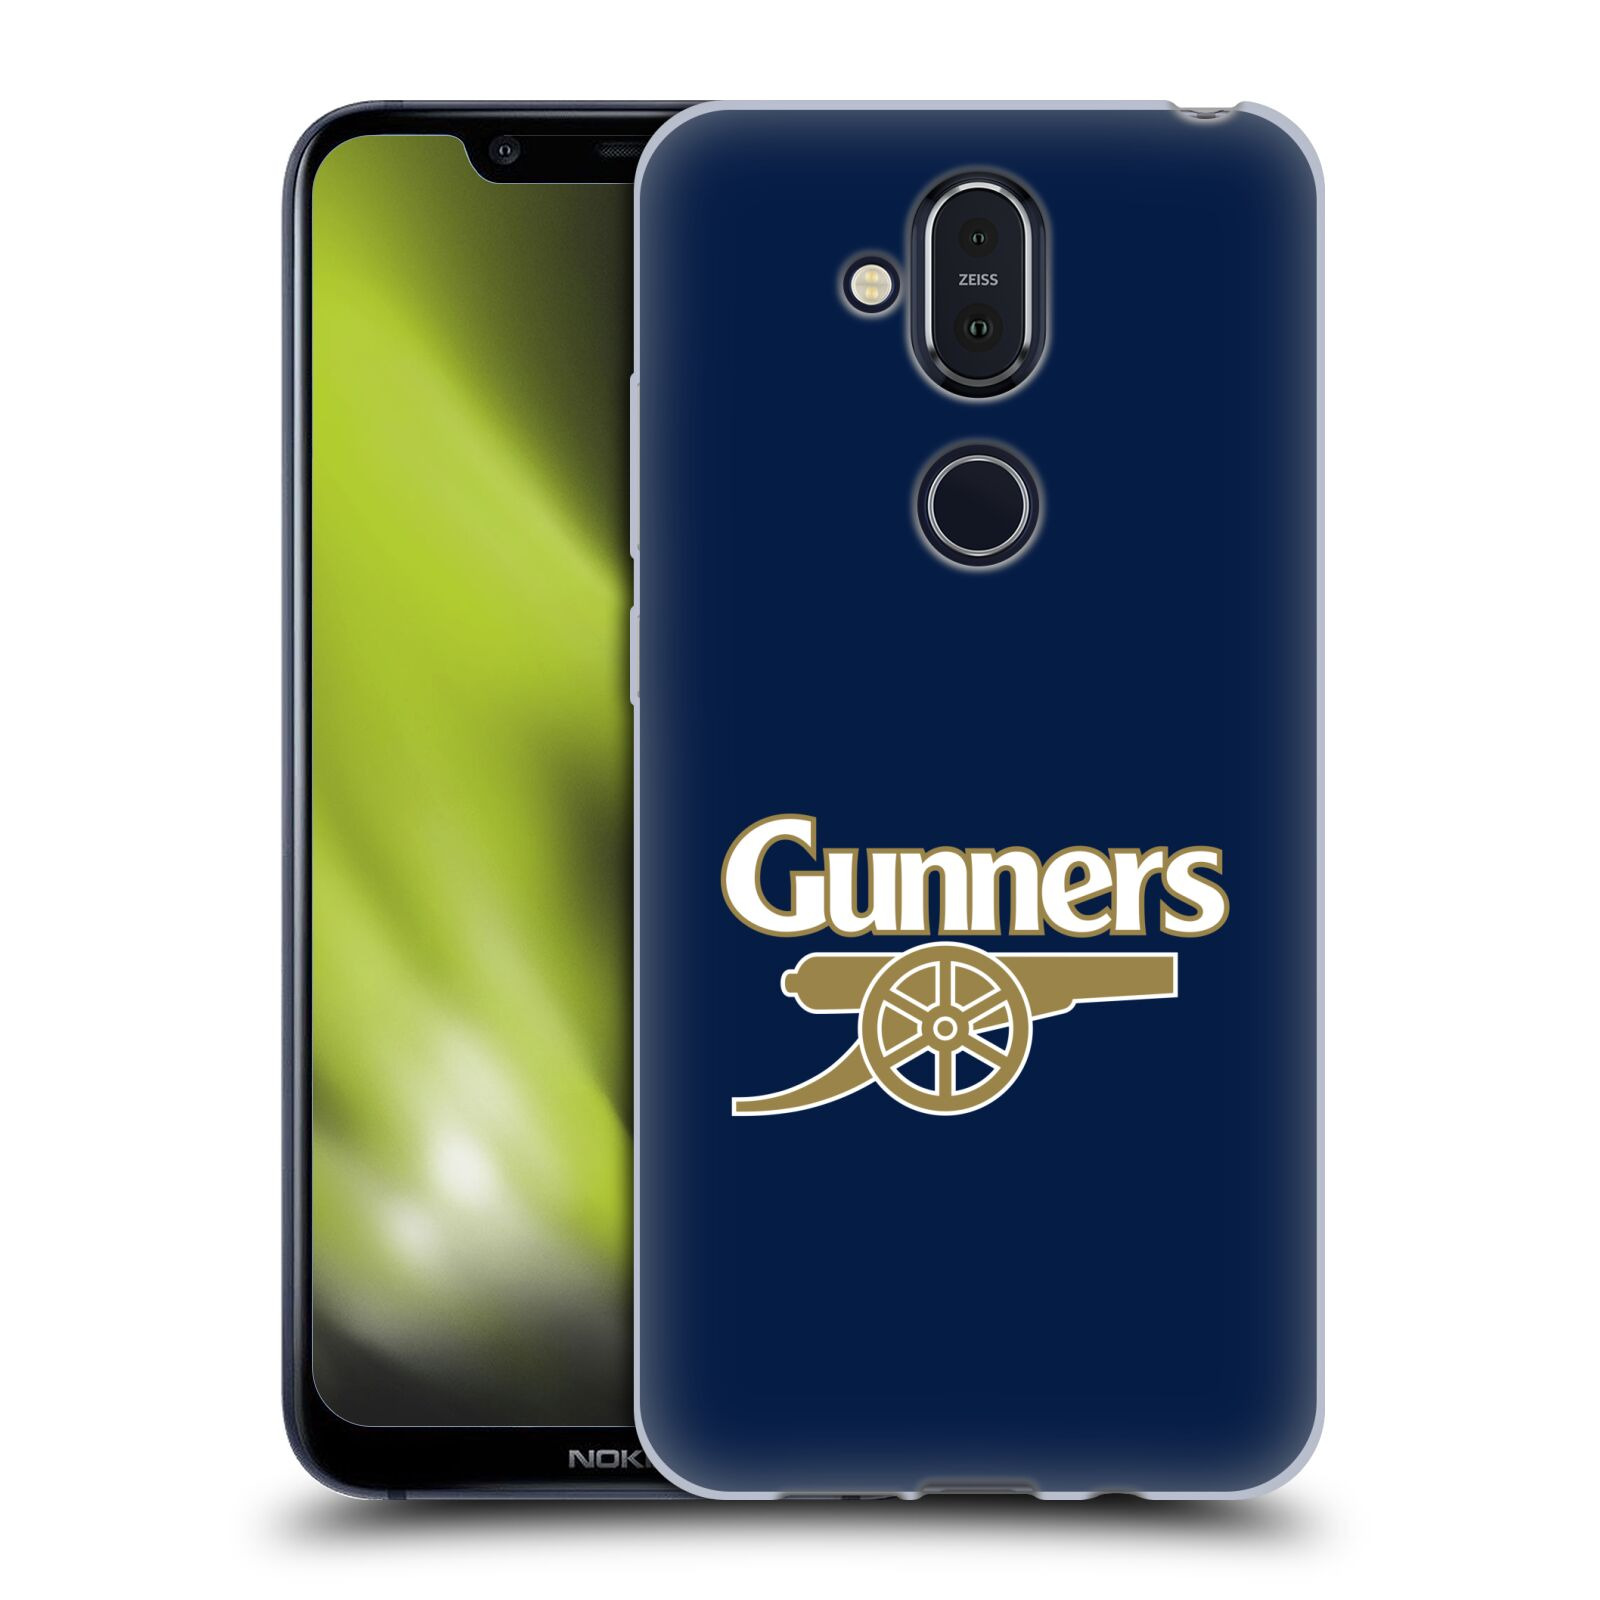 Silikonové pouzdro na mobil Nokia 8.1 - Head Case - Arsenal FC - Gunners